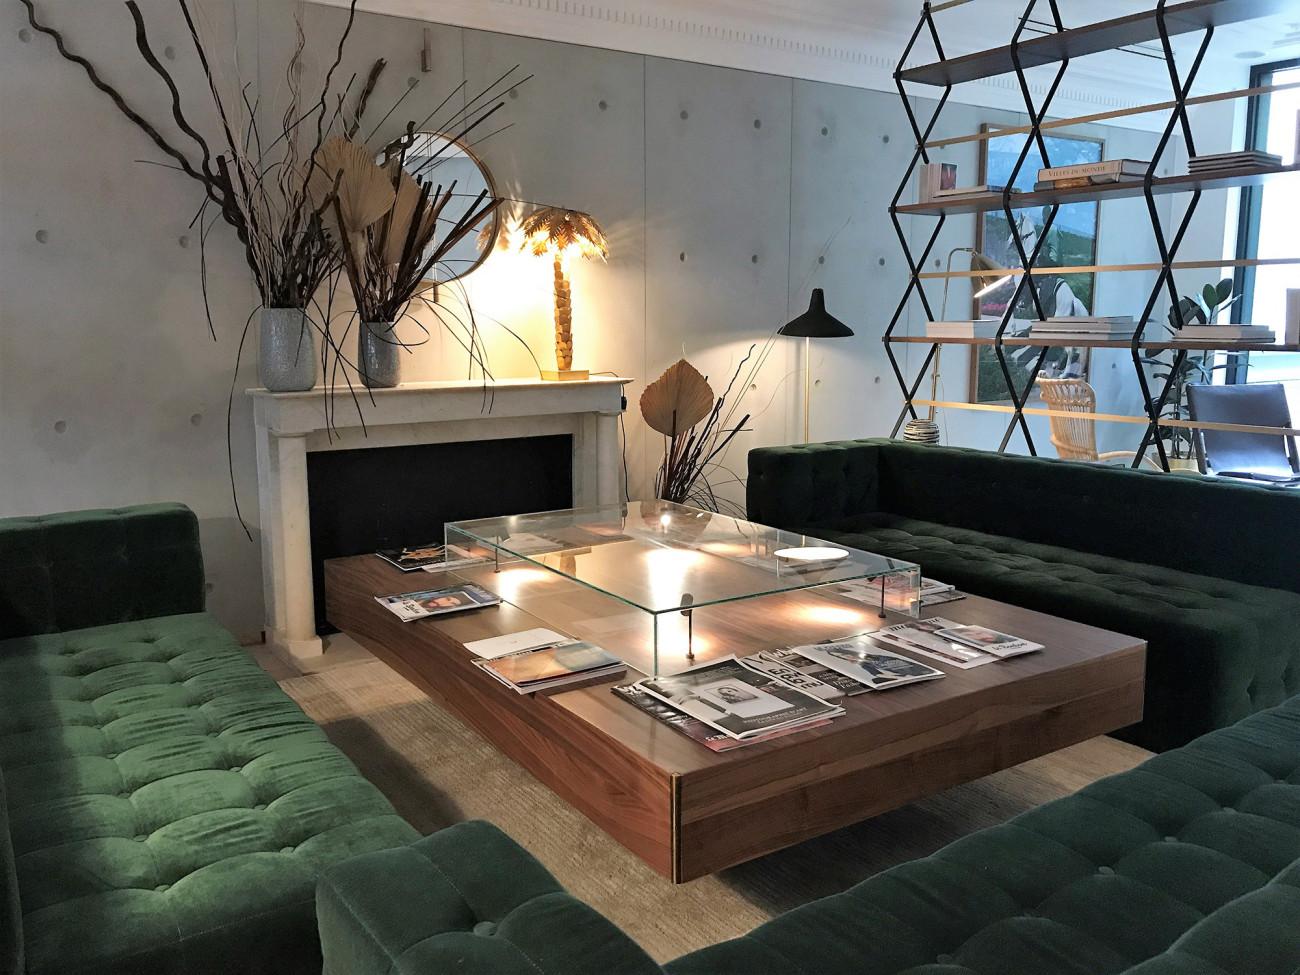 hotel-parister-salon-cheminee-paysage